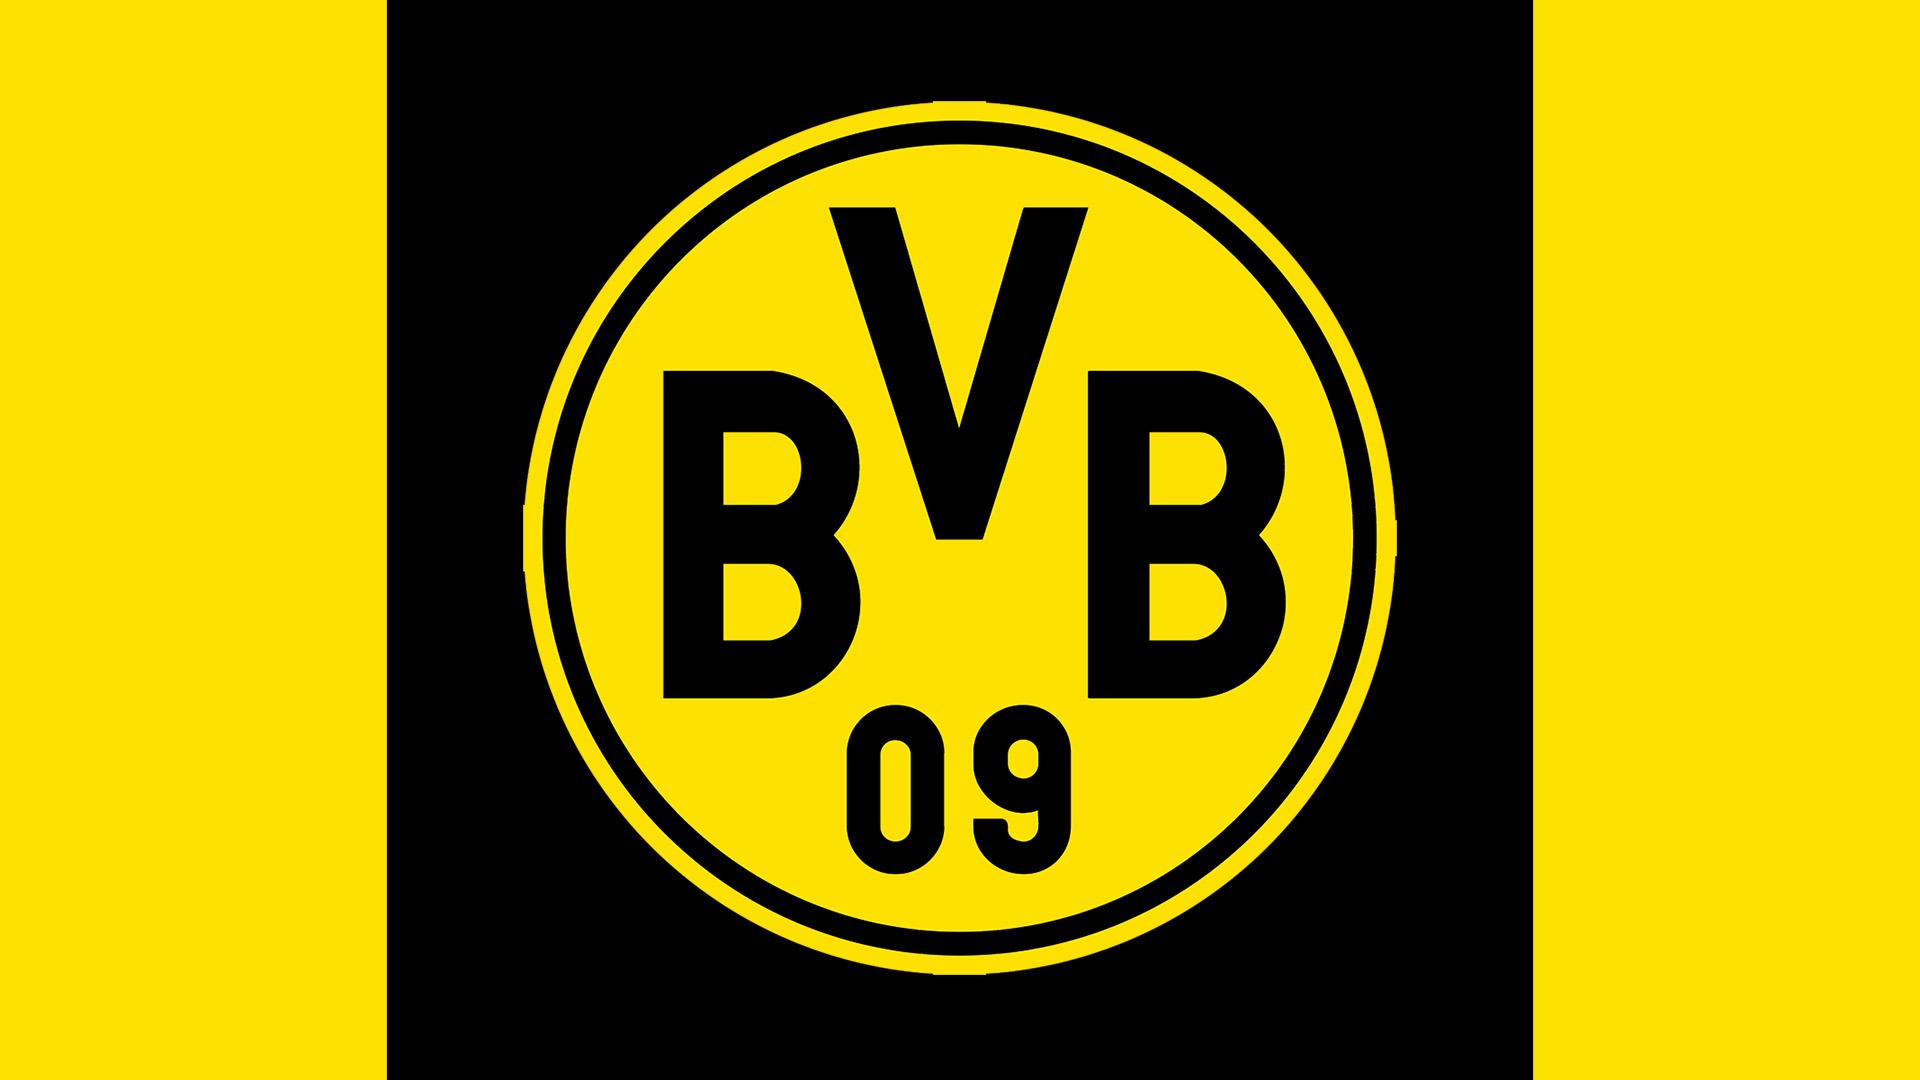 Bvb Logo Download Kostenlos